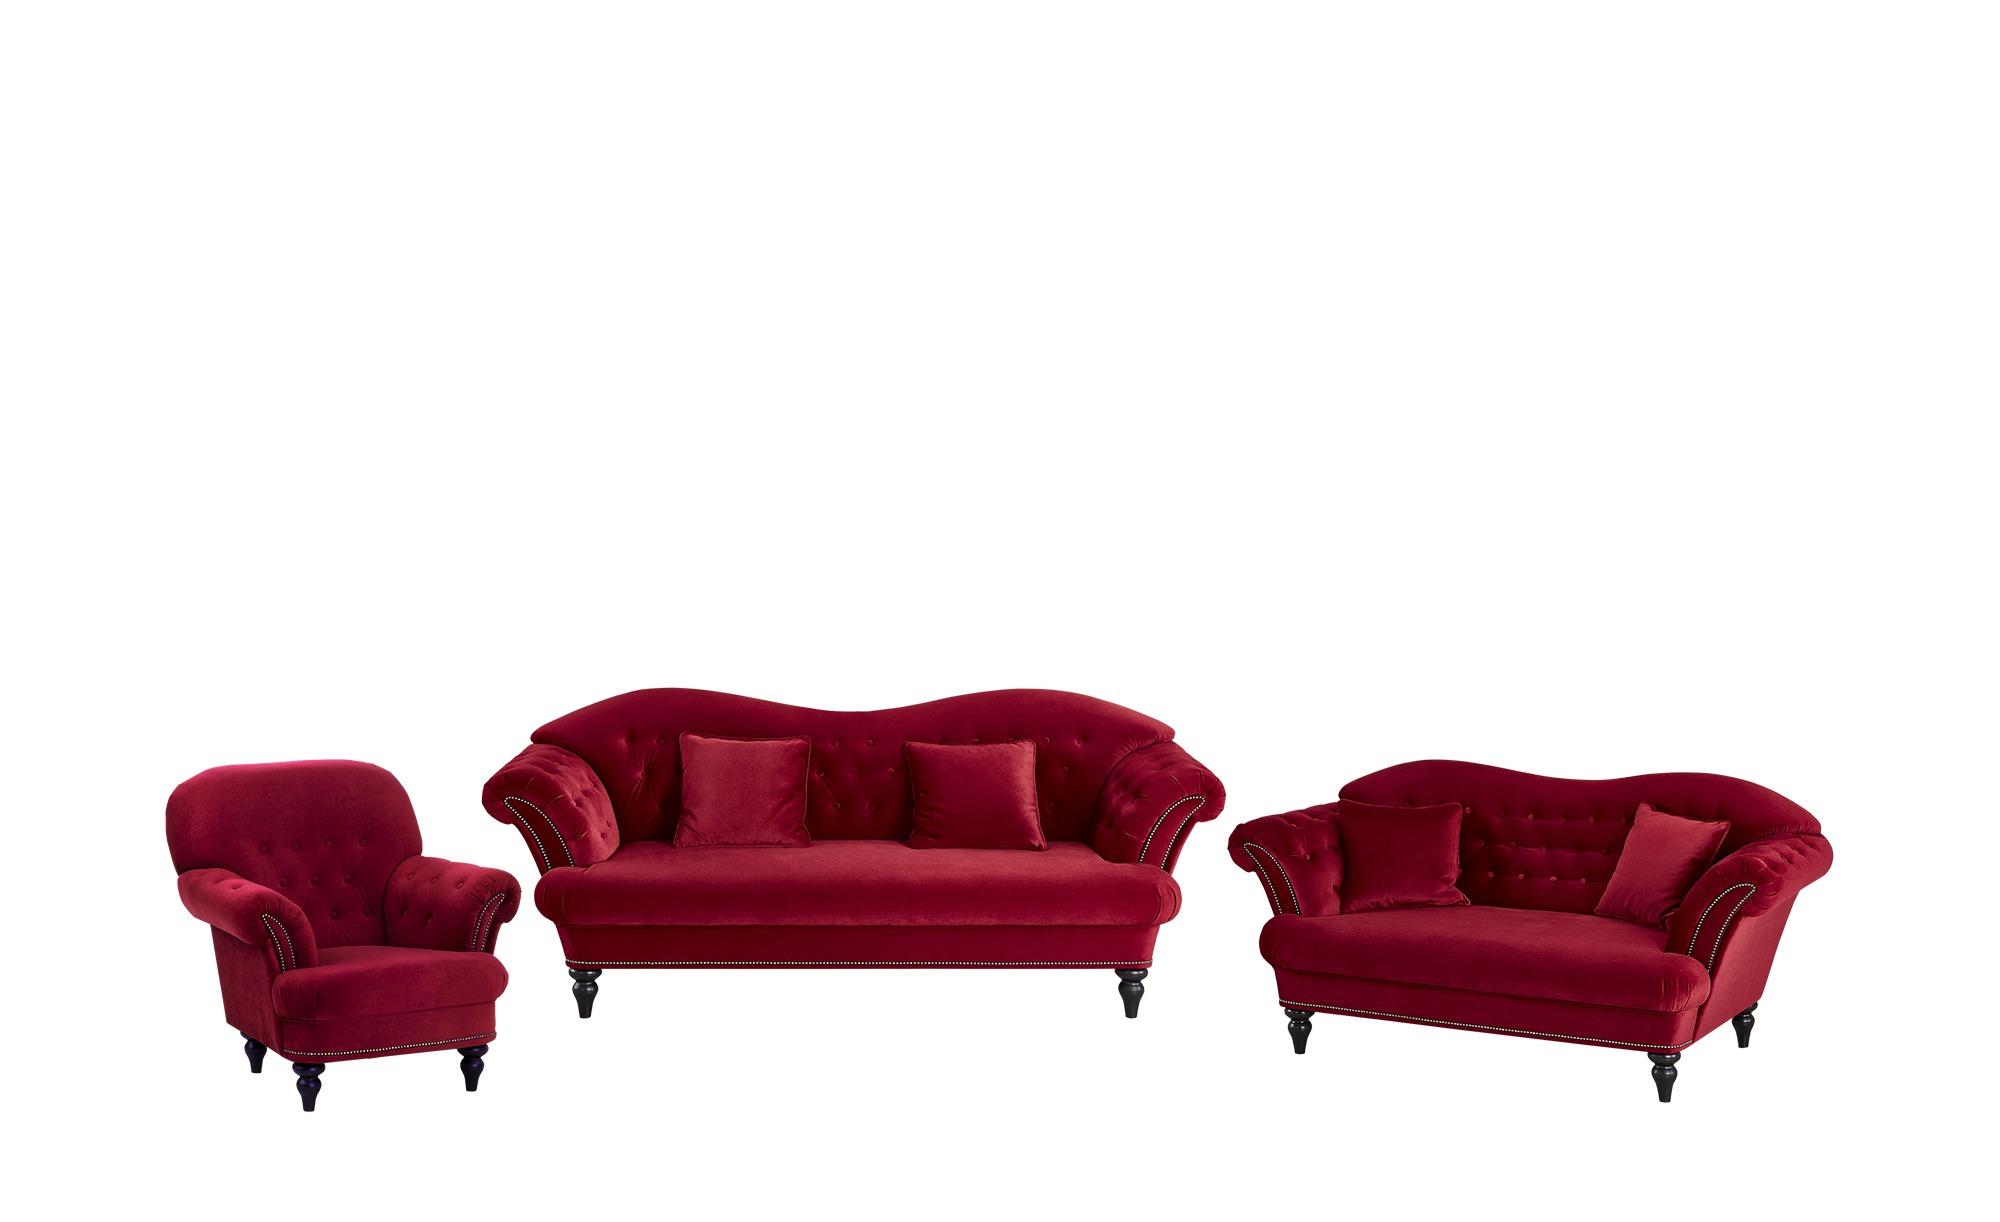 Sitzgruppe 3-teilig Sissi, gefunden bei Möbel Höffner